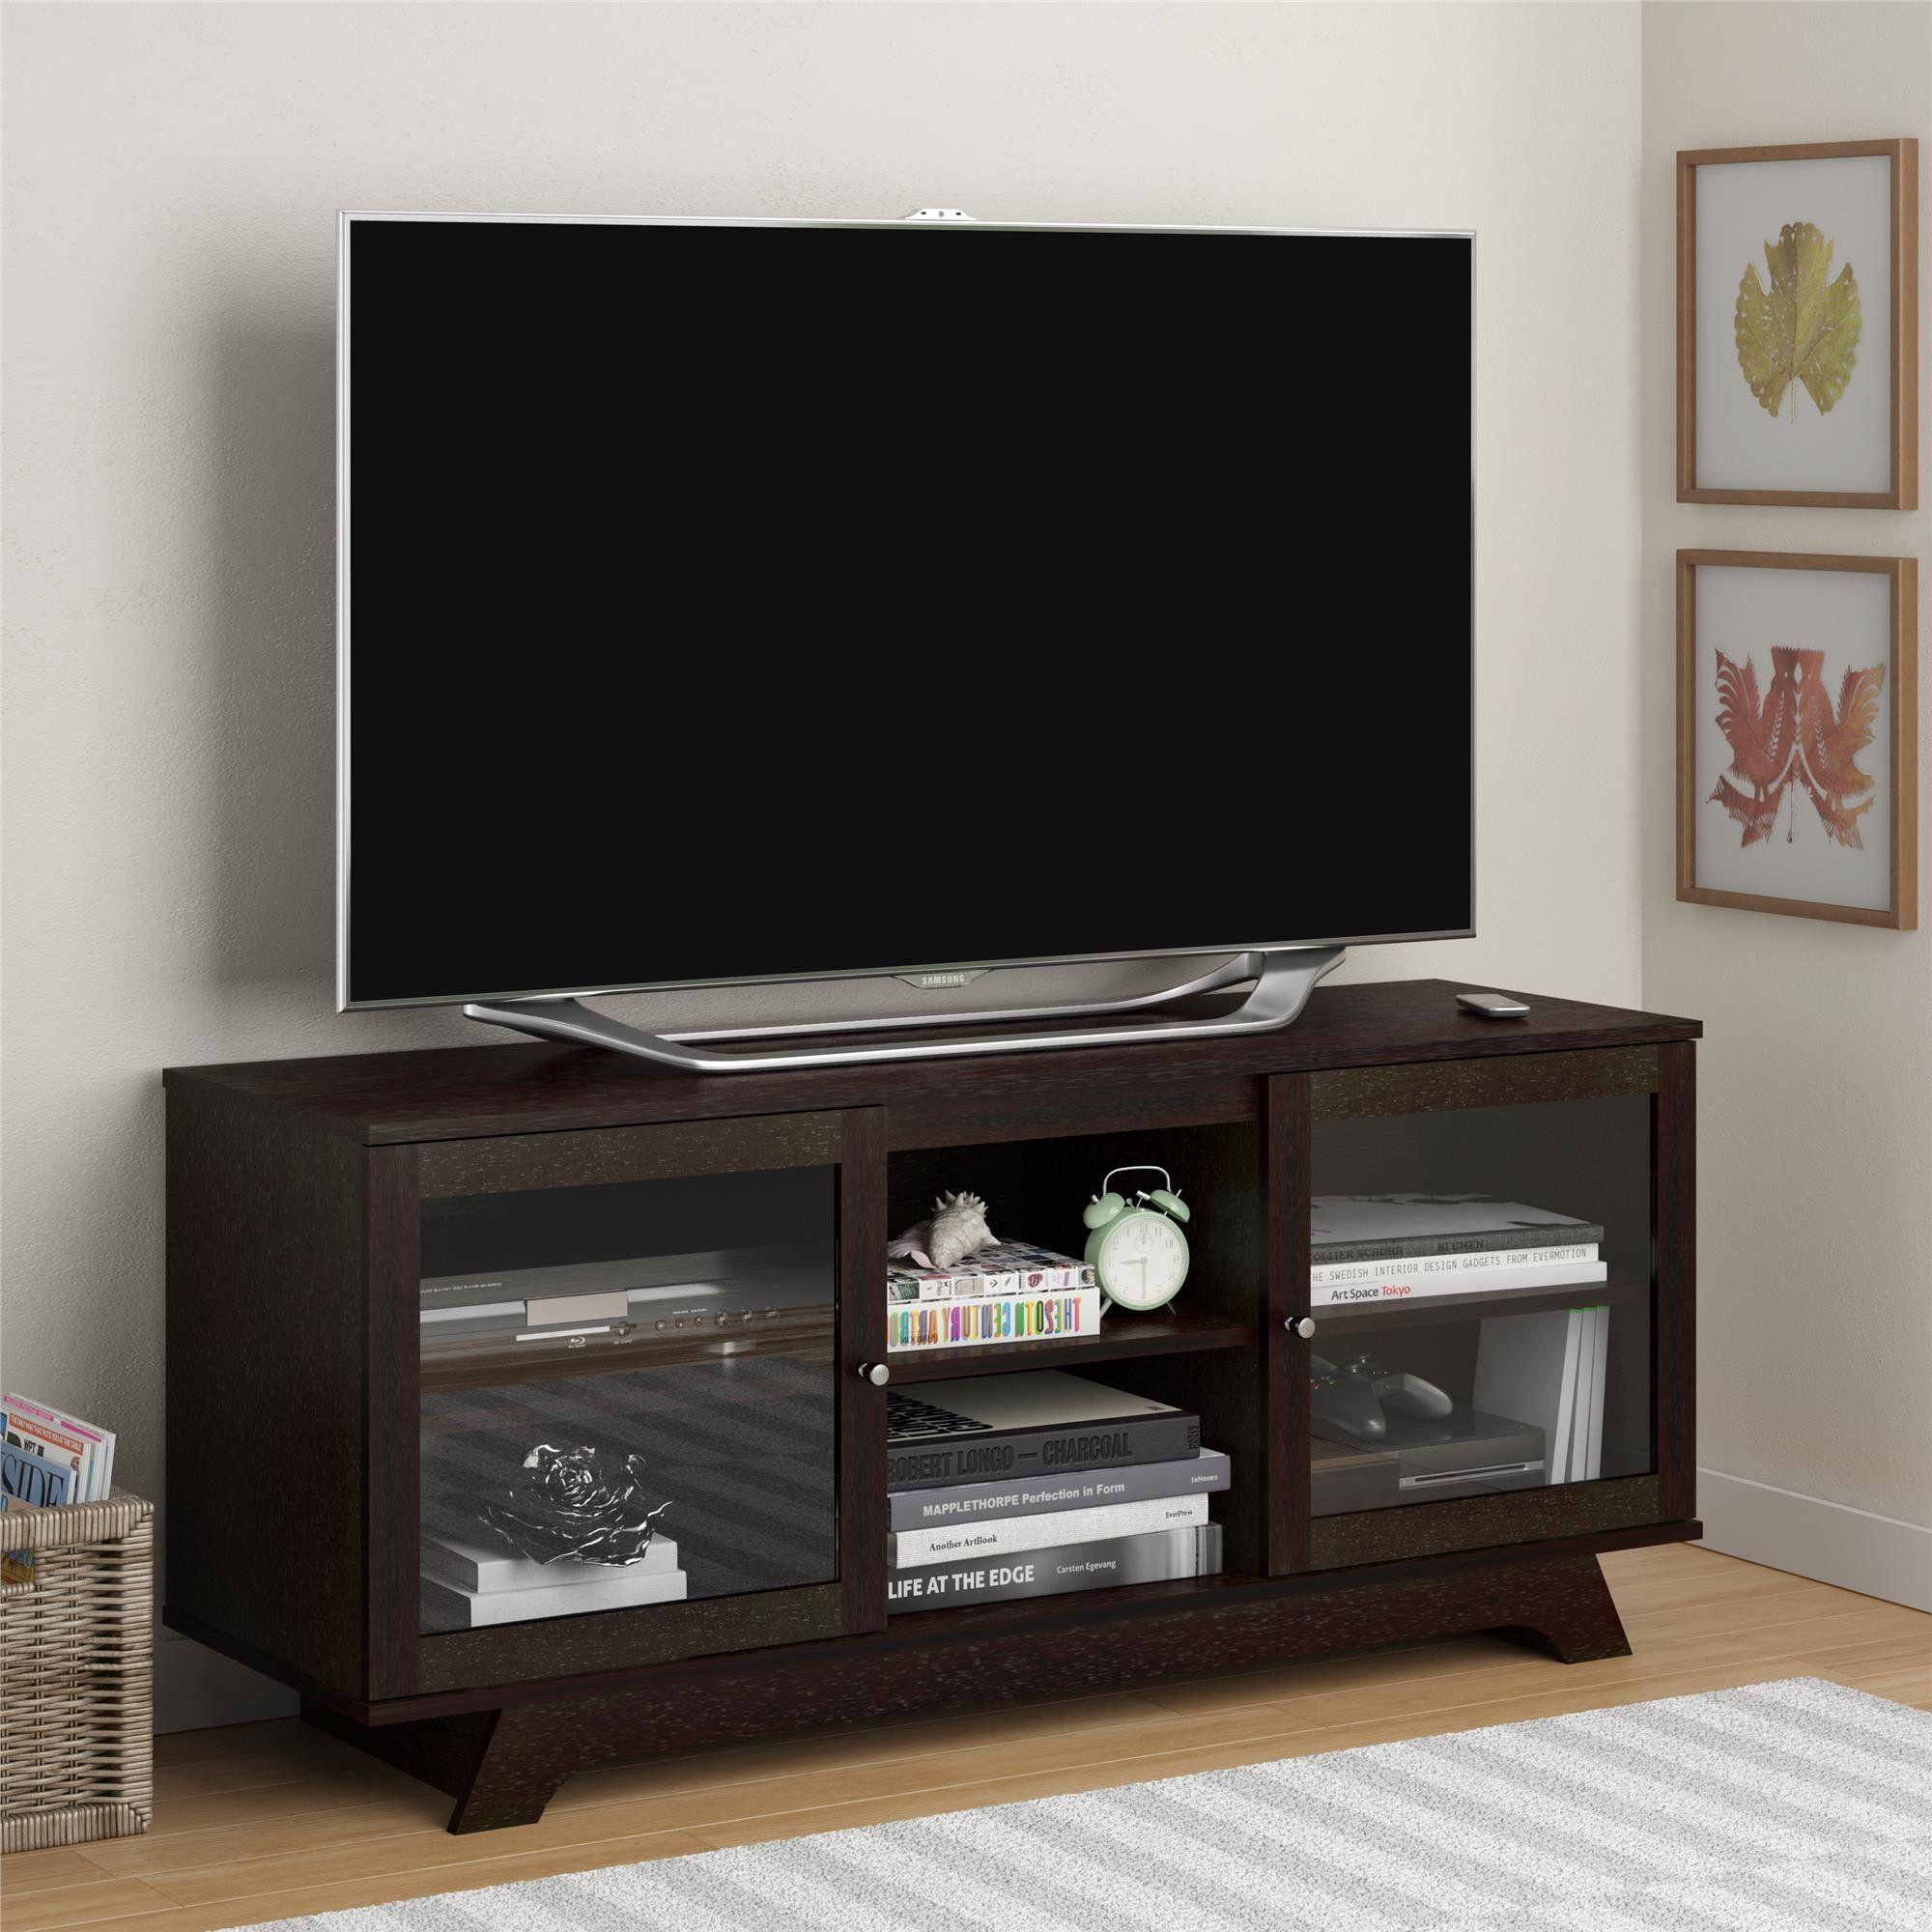 Magnolia 55 Tv Stand Products Tv Stand Decor Modern Corner